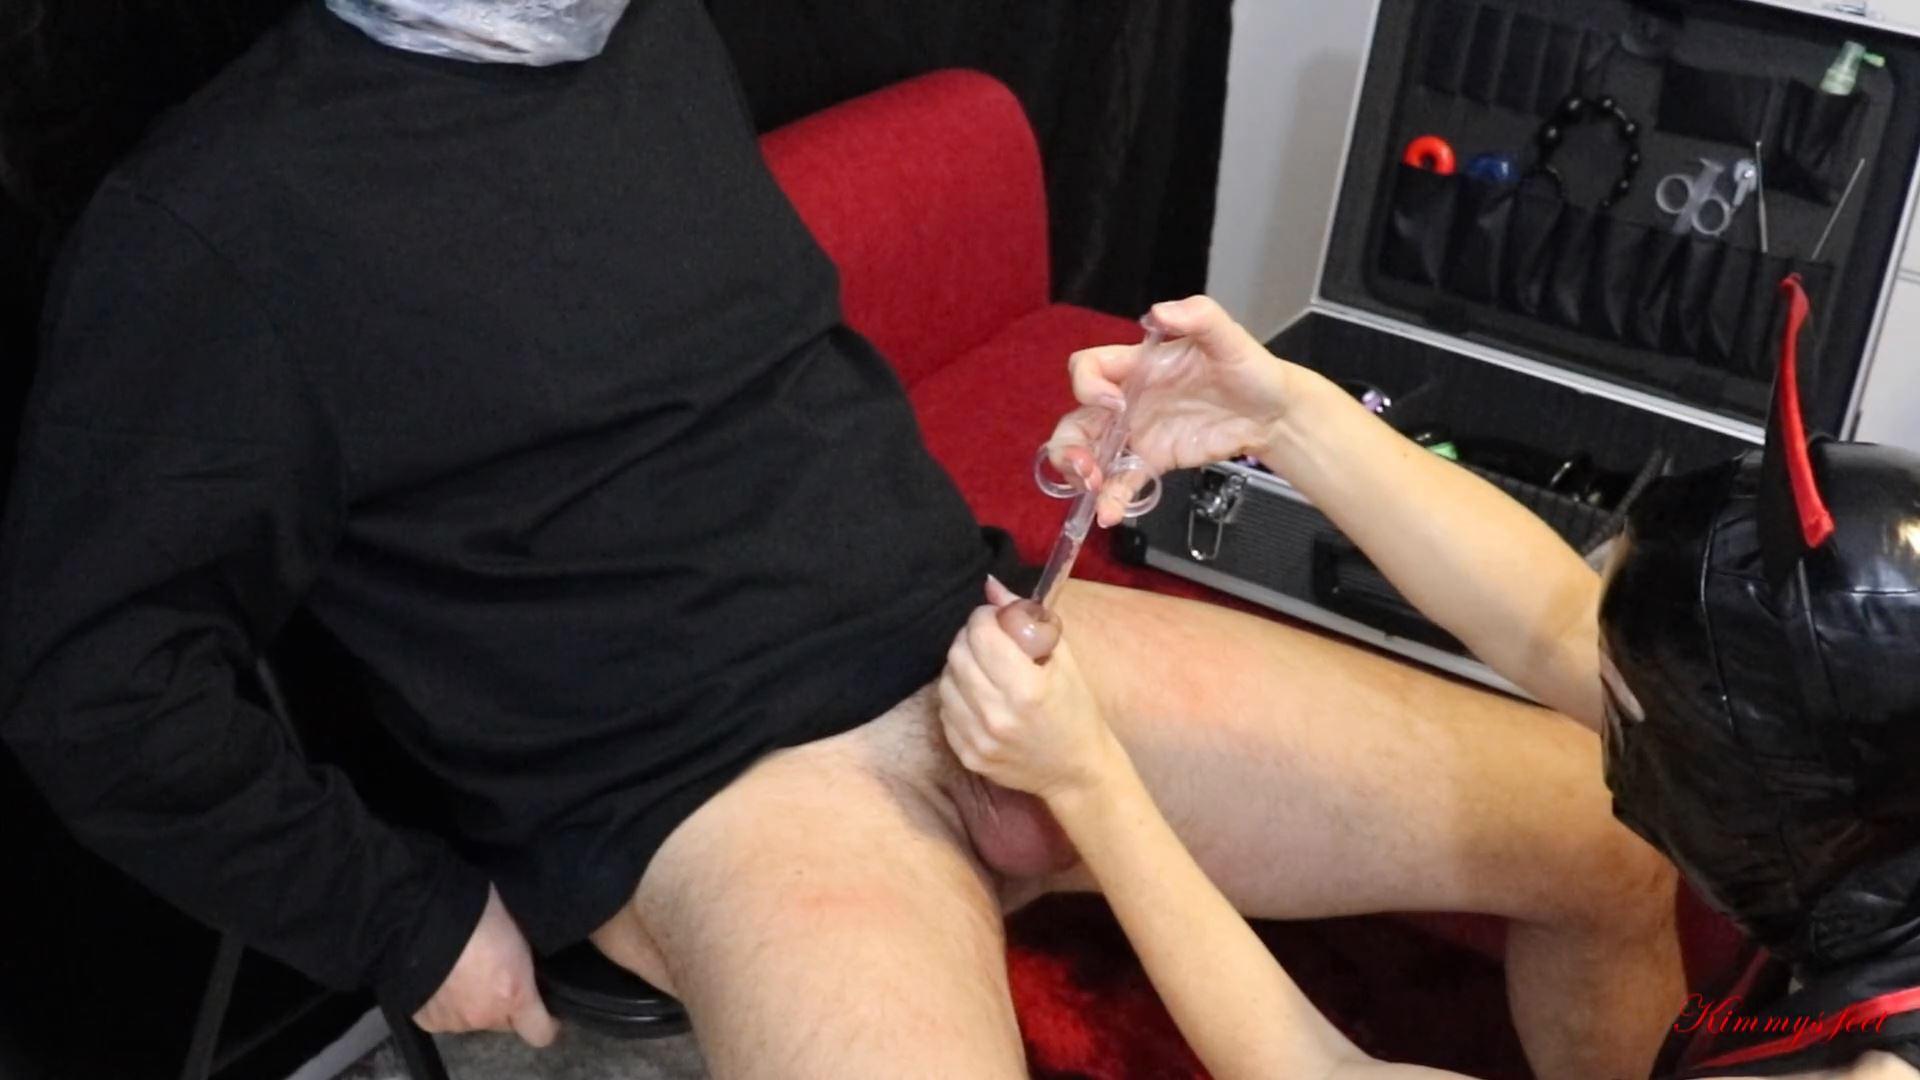 Sadistic Nurse Breathplay Plastic Bag Ballbusting Gloved Handjob Sm - KIMMYS FEET - FULL HD/1080p/MP4